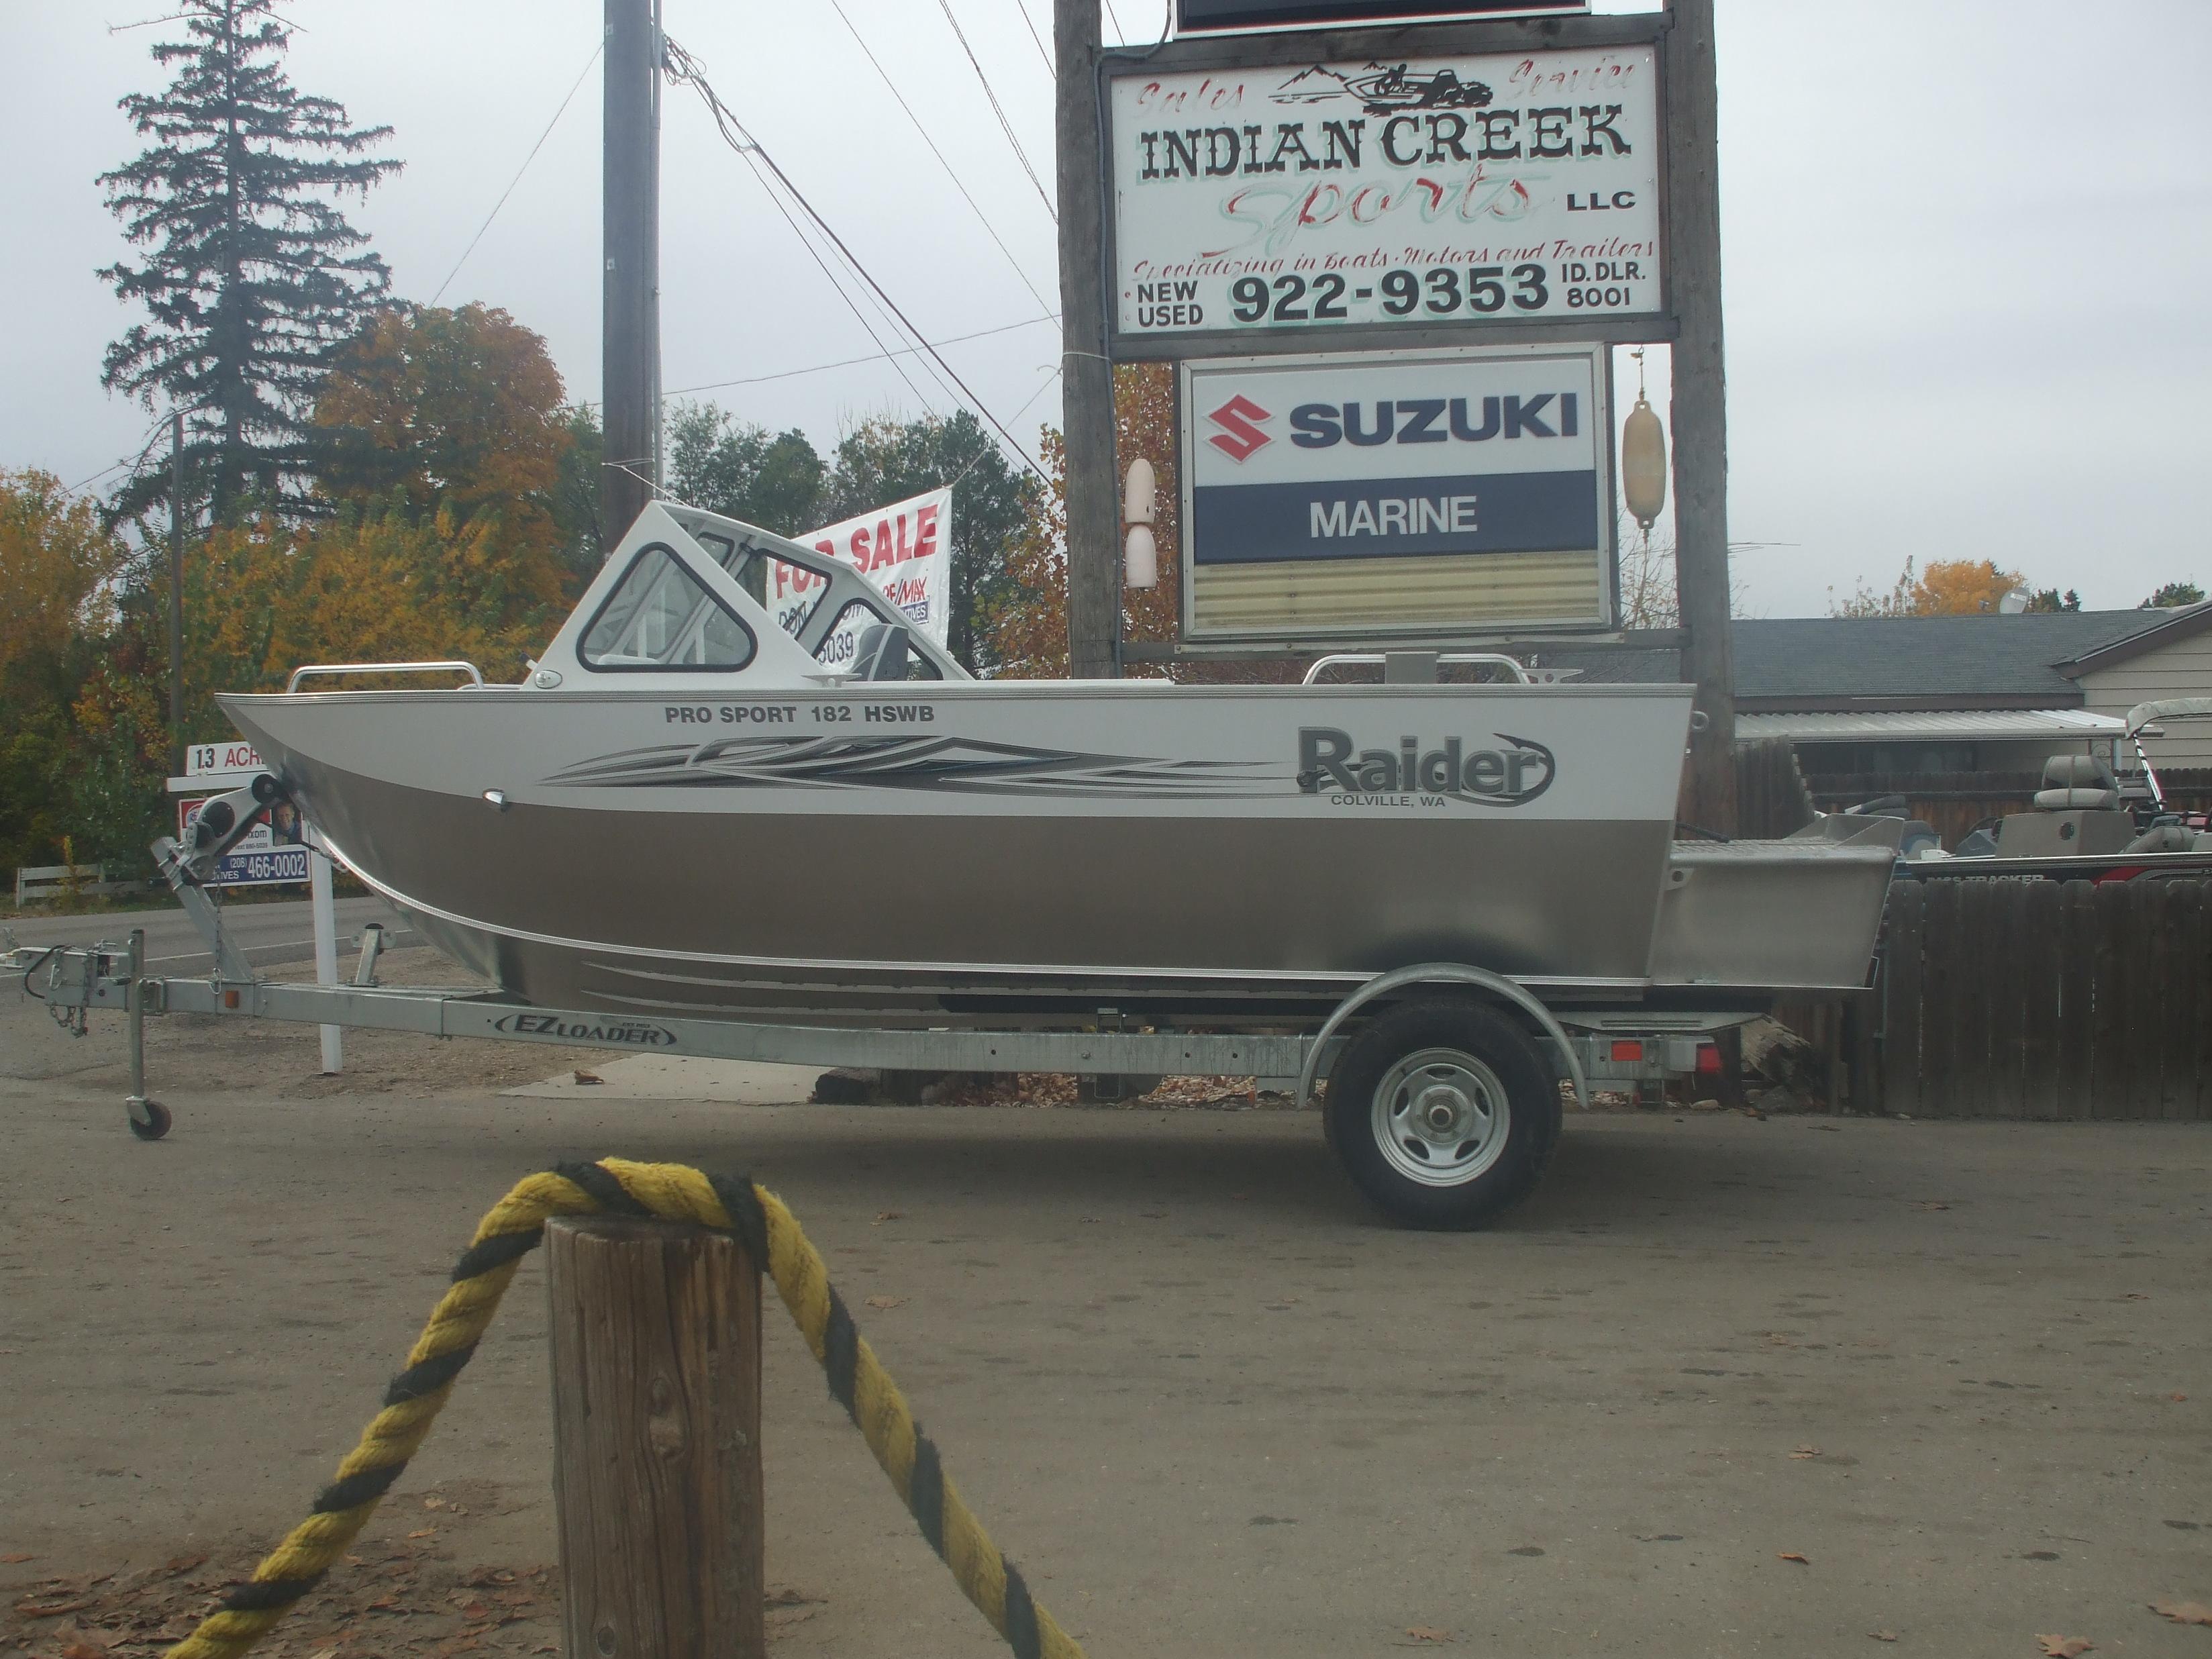 2017 Pro Sport 182 Raider boat